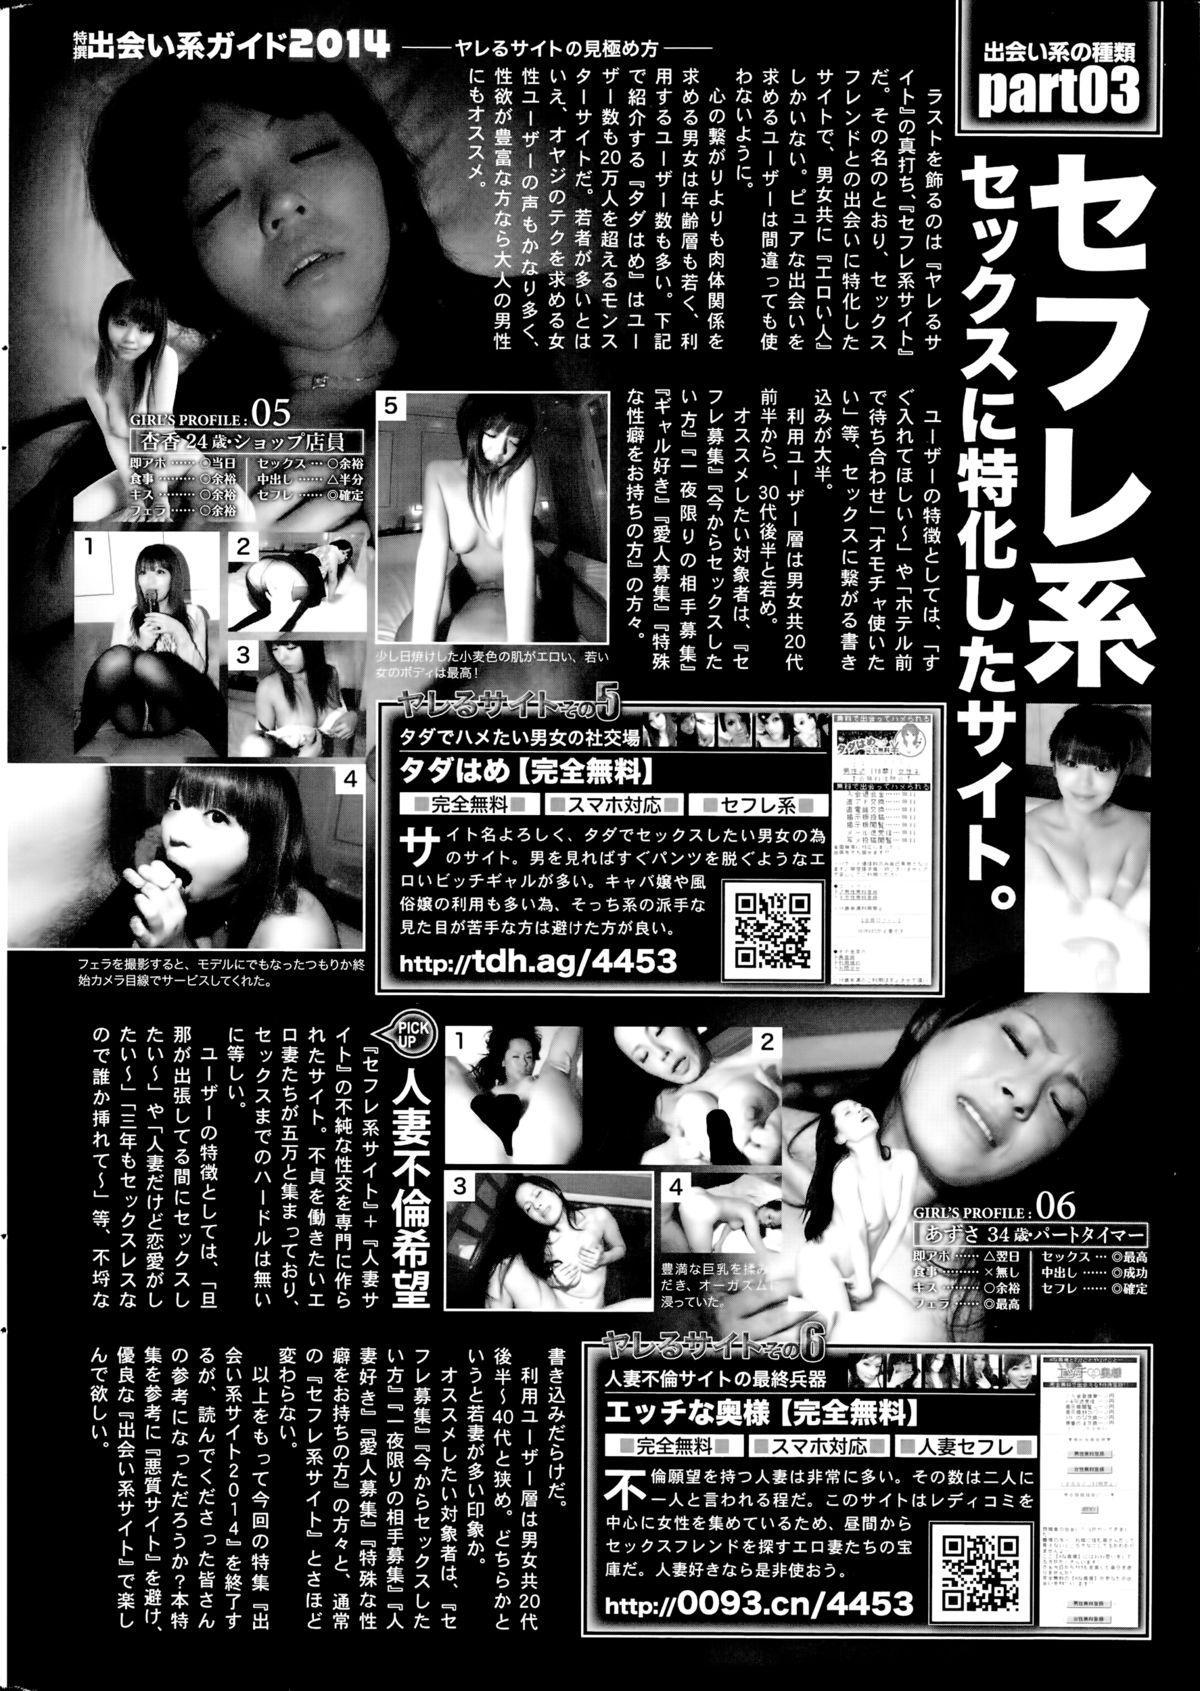 COMIC SIGMA 2014-09 Vol.81 255